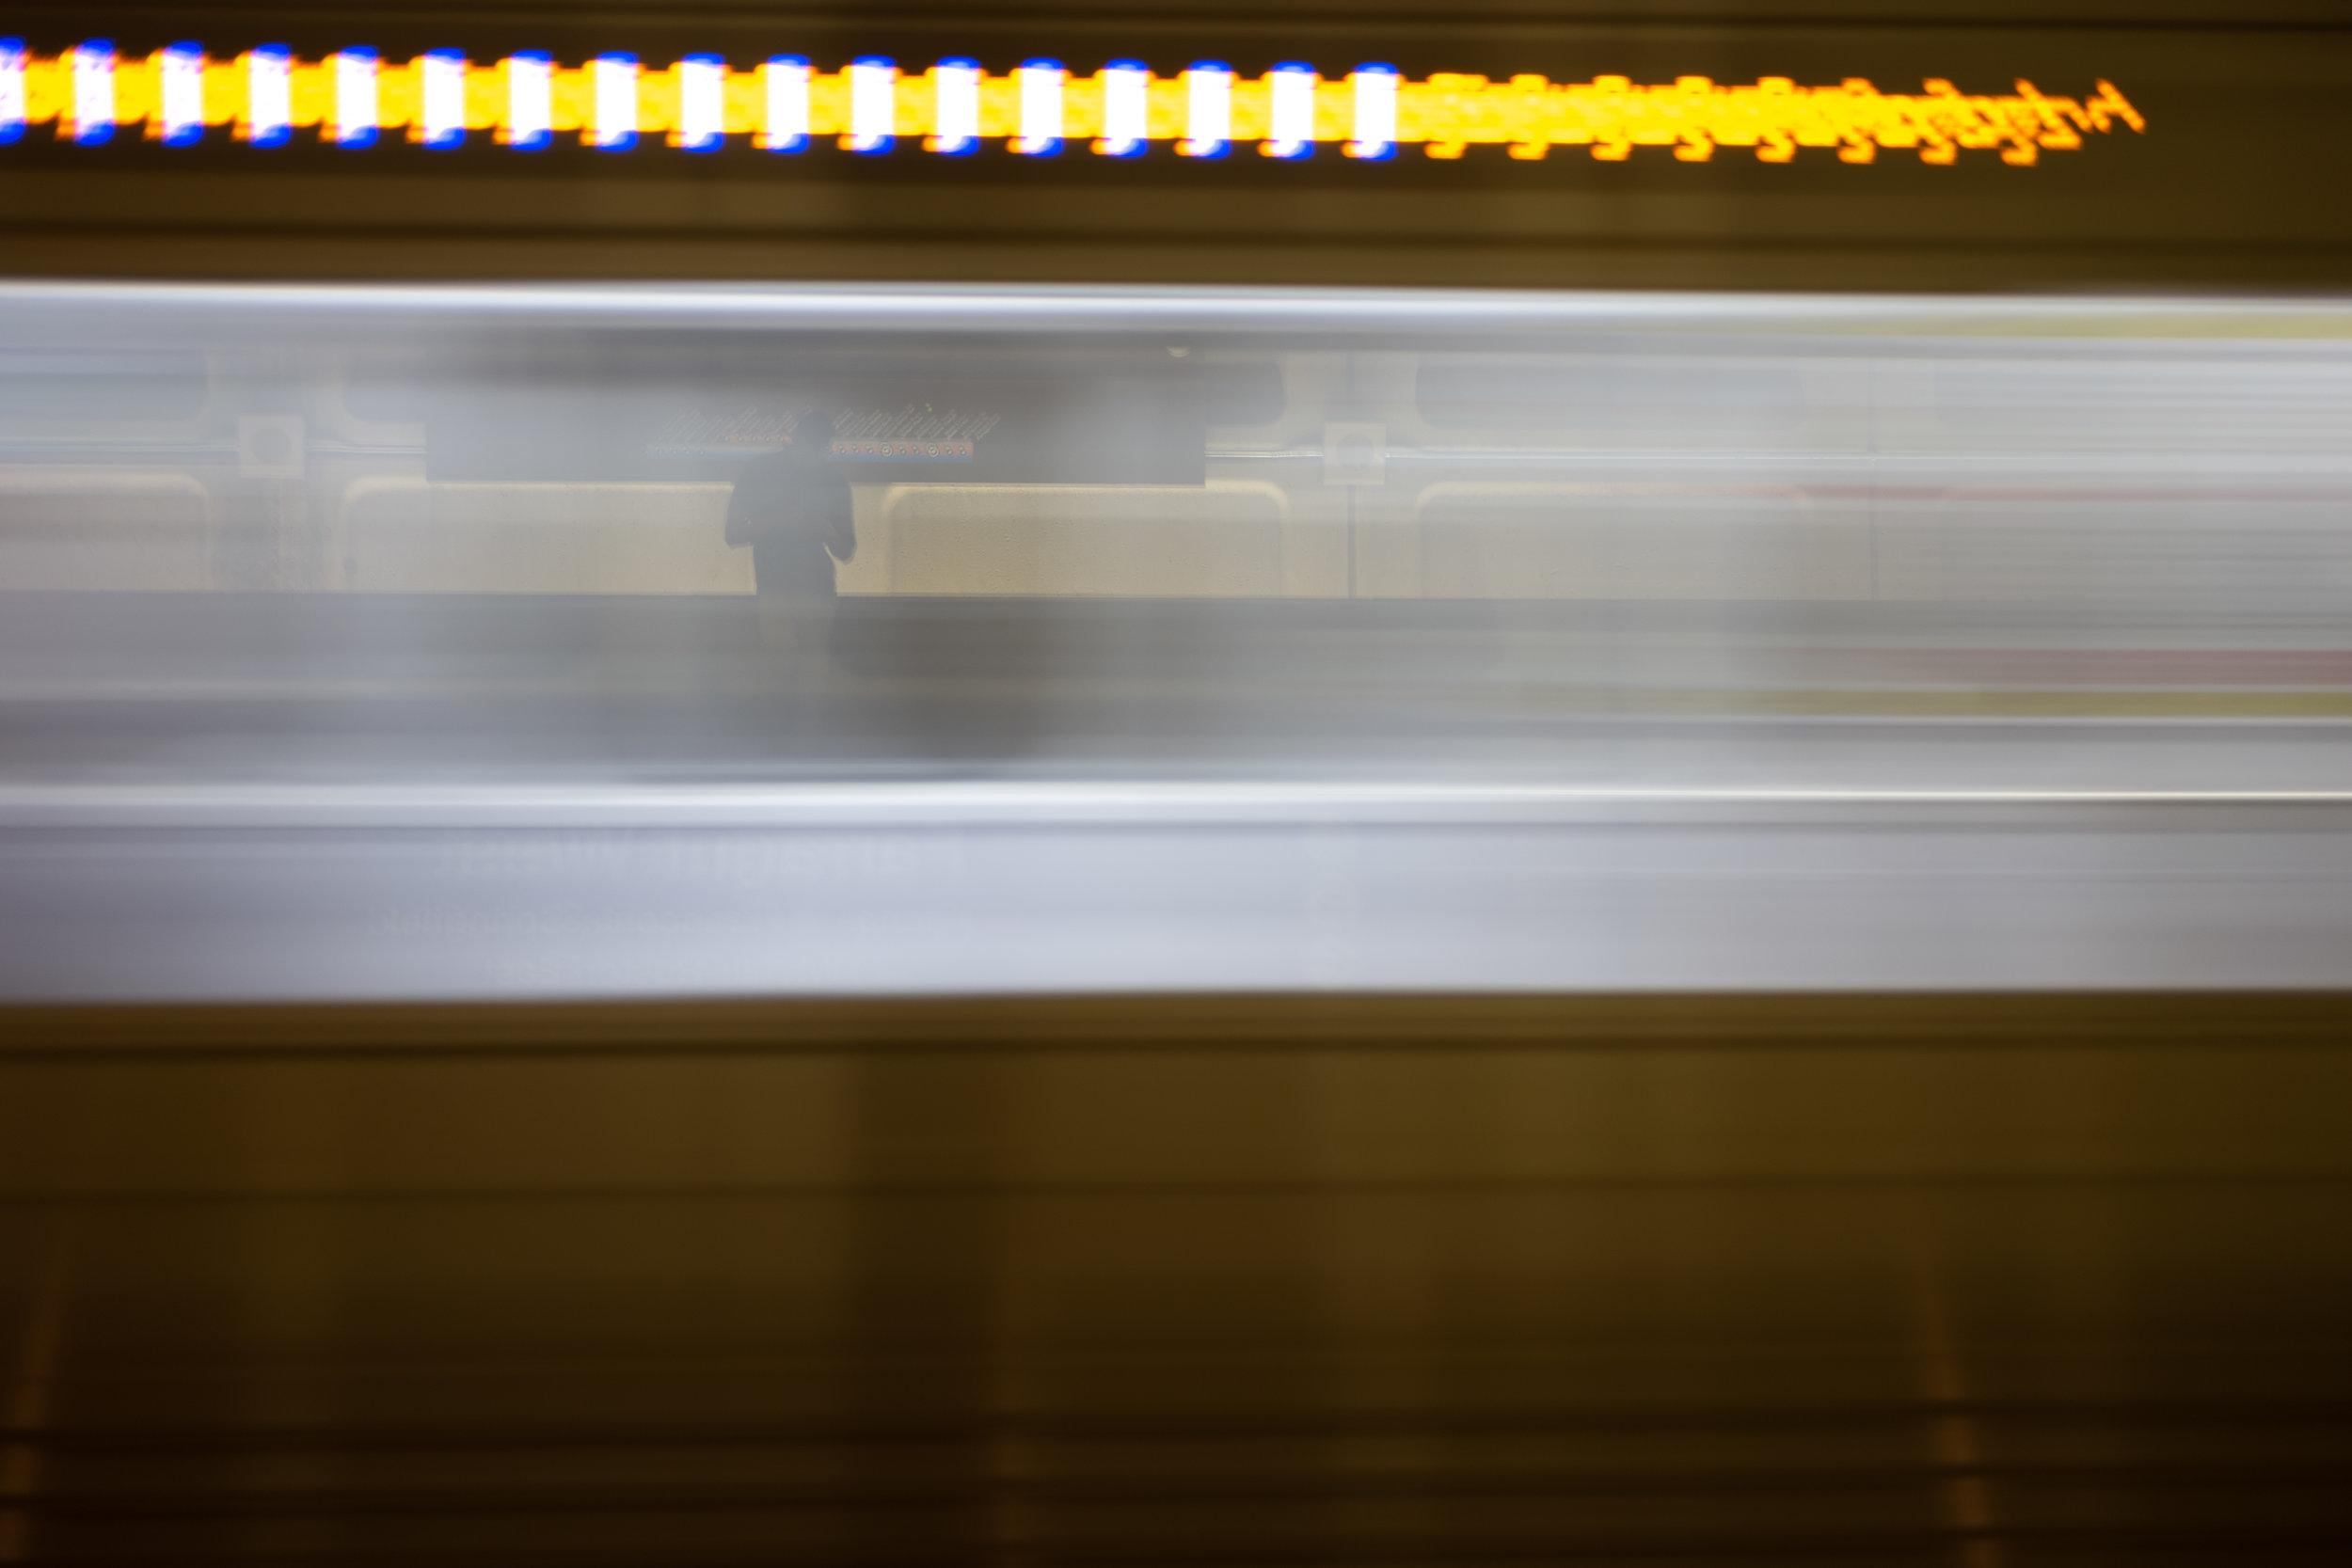 Train Man Washington, DC, USA Leica SL 50mm f/2.0 APO Summicron © Keith R. Sbiral, 2018